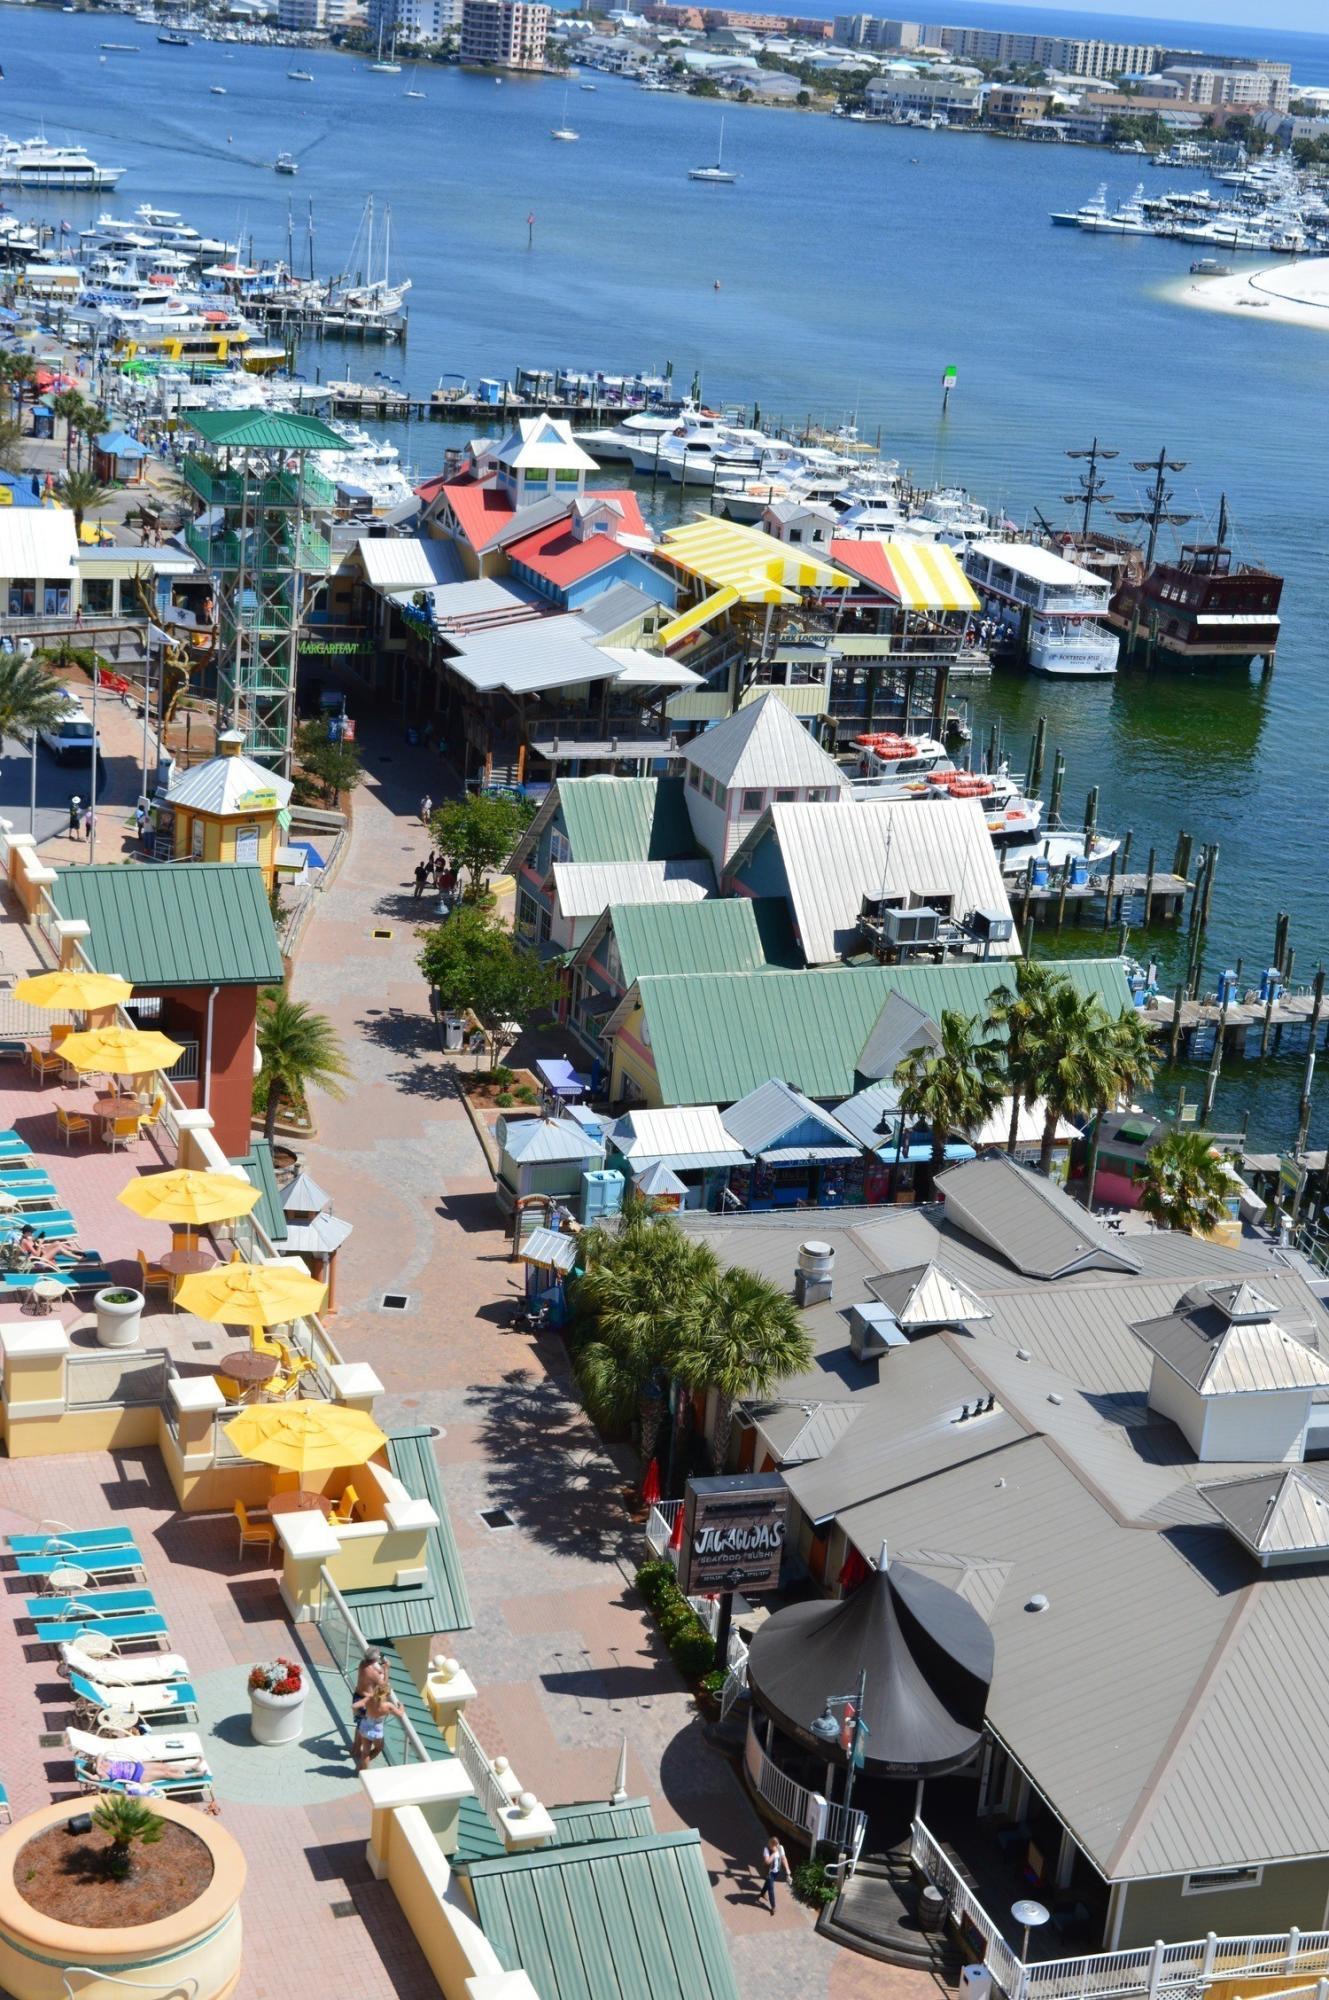 Harborwalk Village Below The Resort